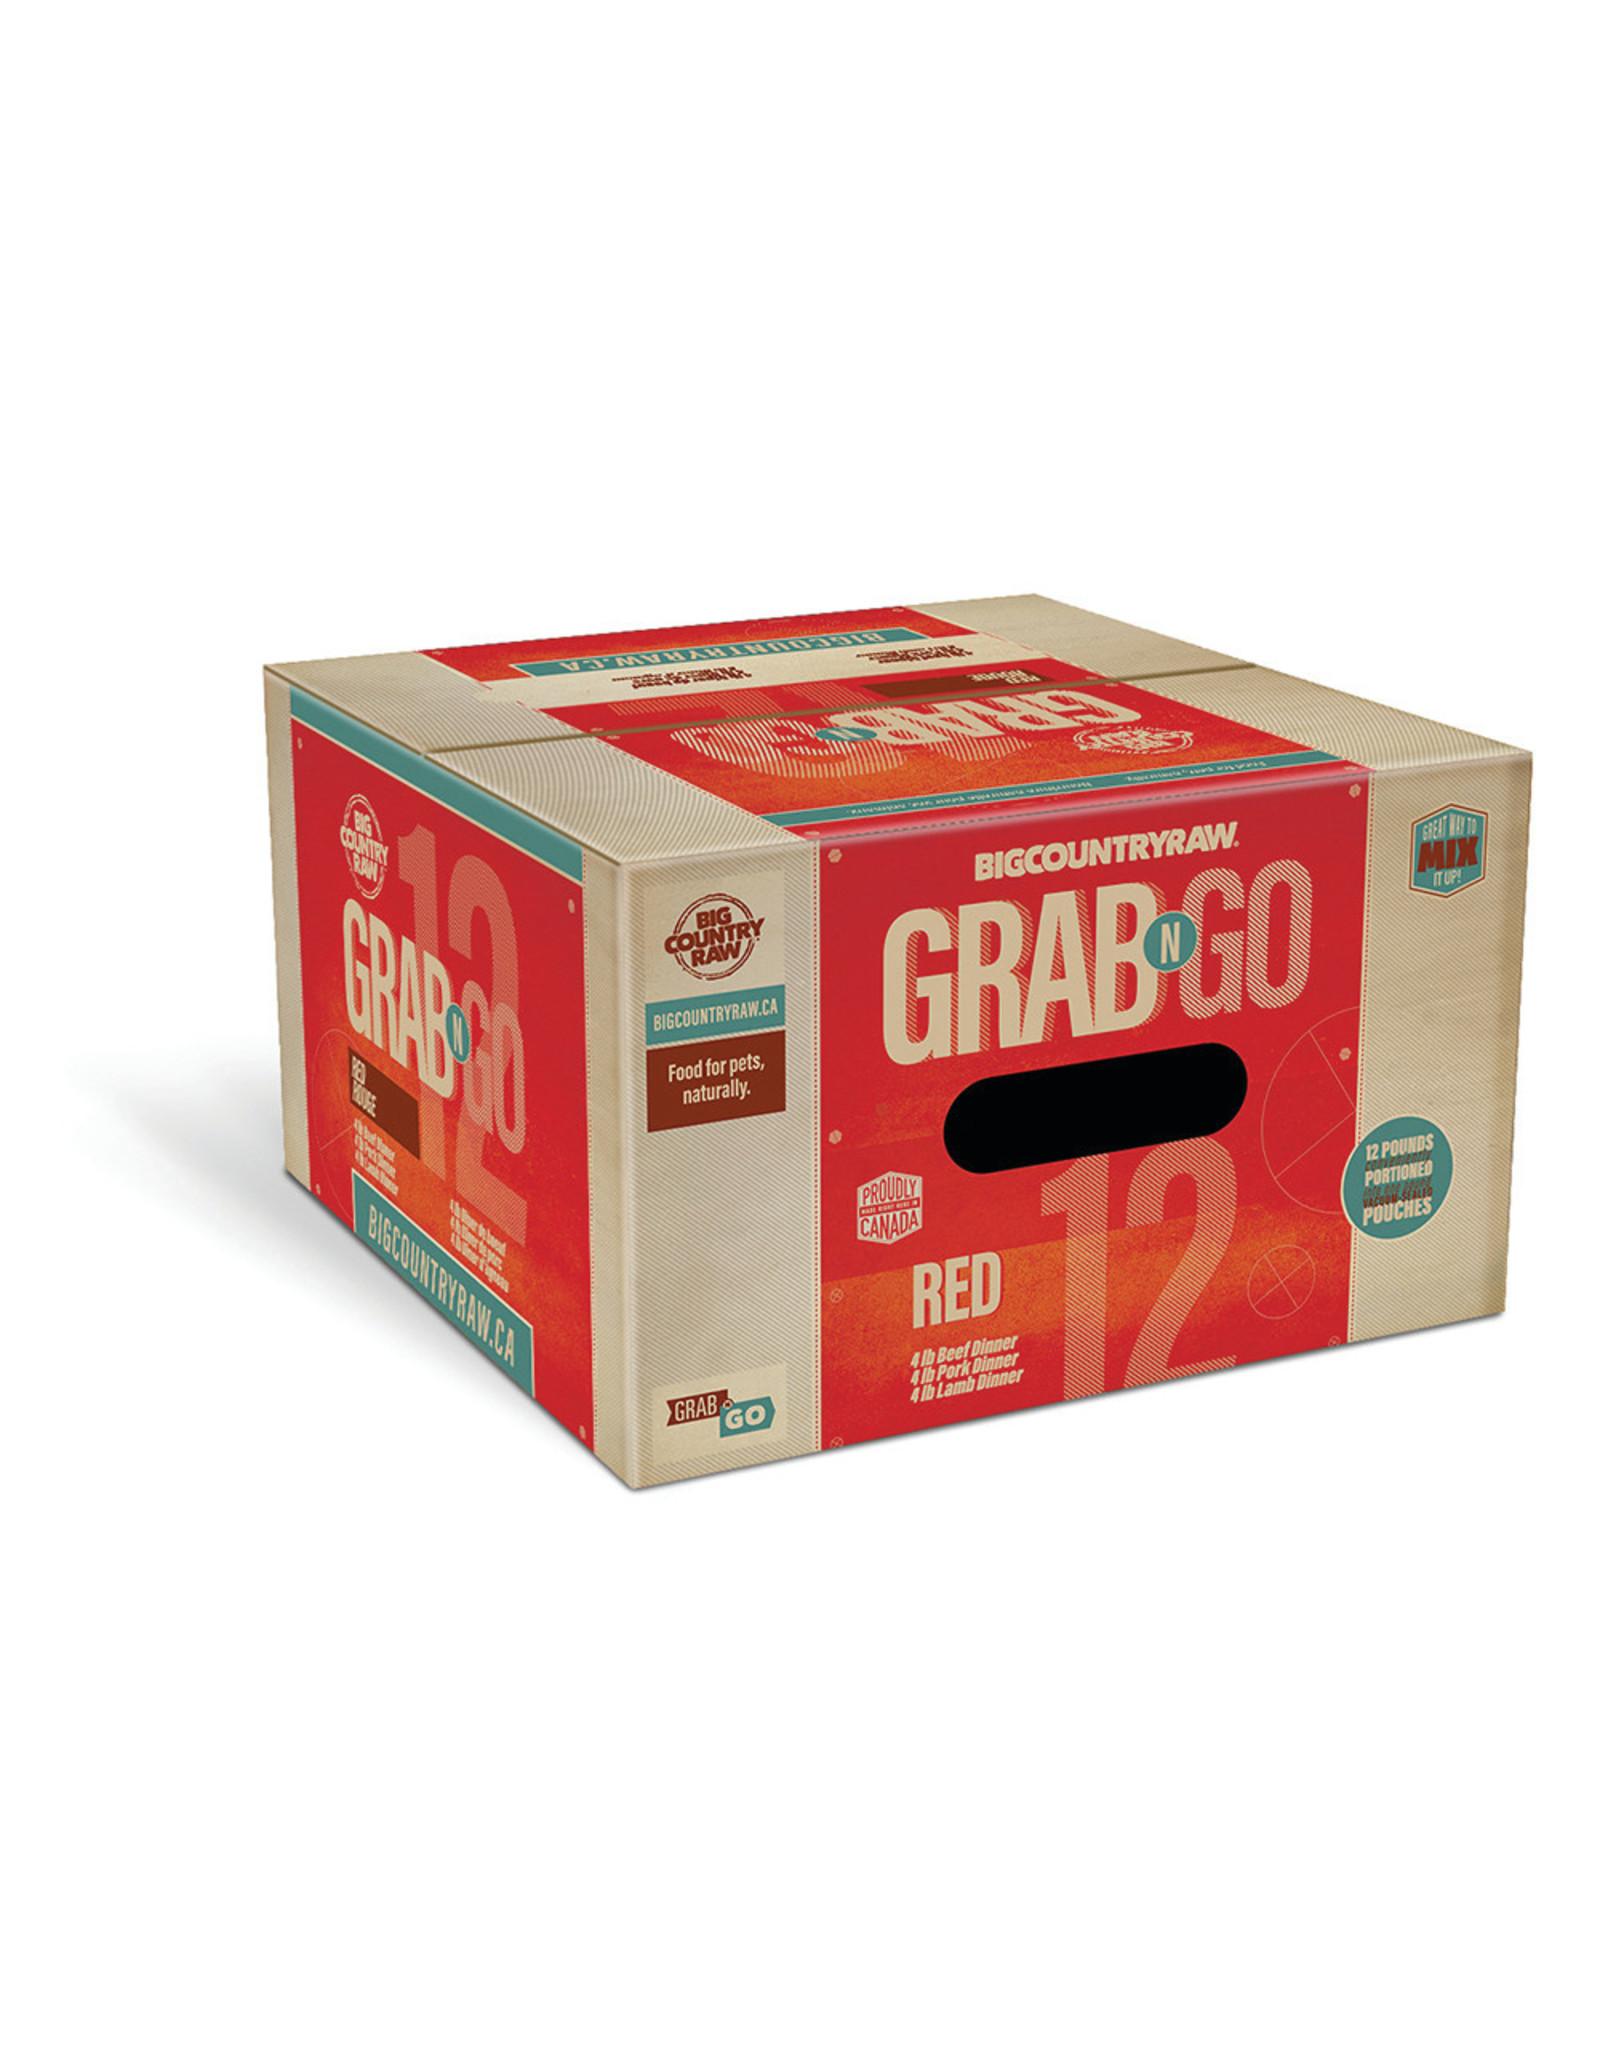 Big Country Raw BCR 12lb Mini Grab N Go Red Deal